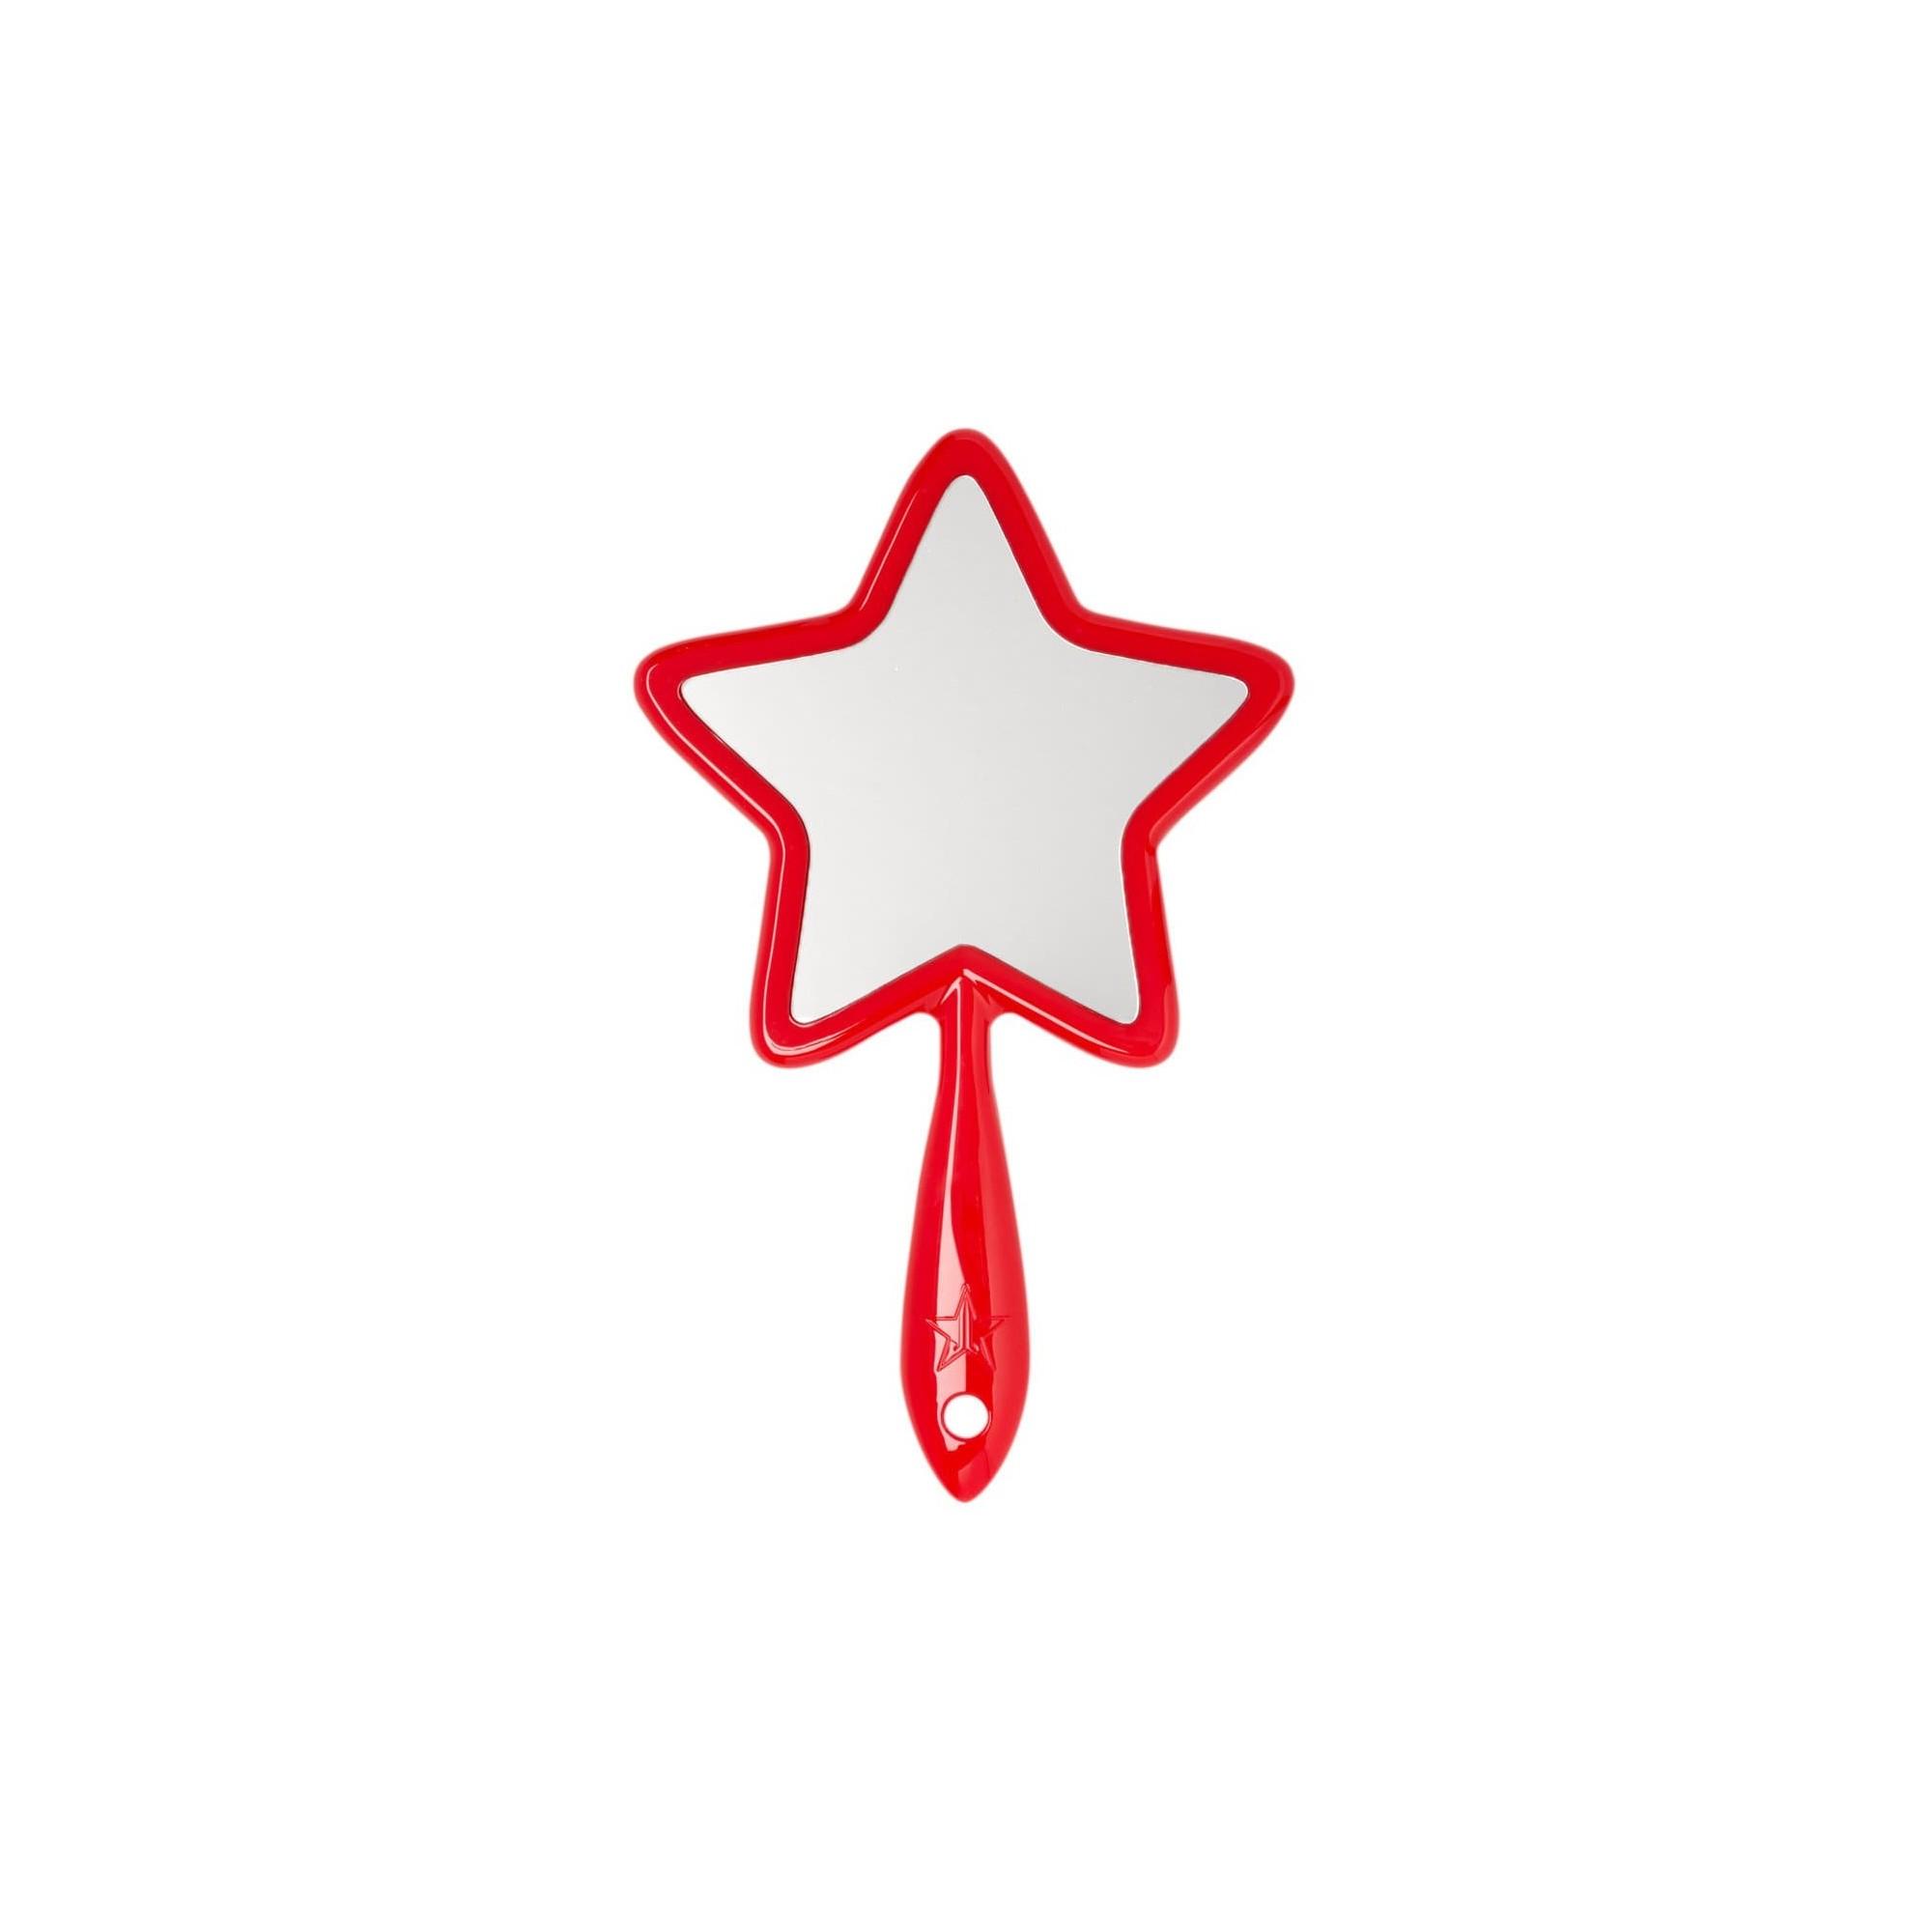 Jeffree Star Cosmetics Star Mirror Red